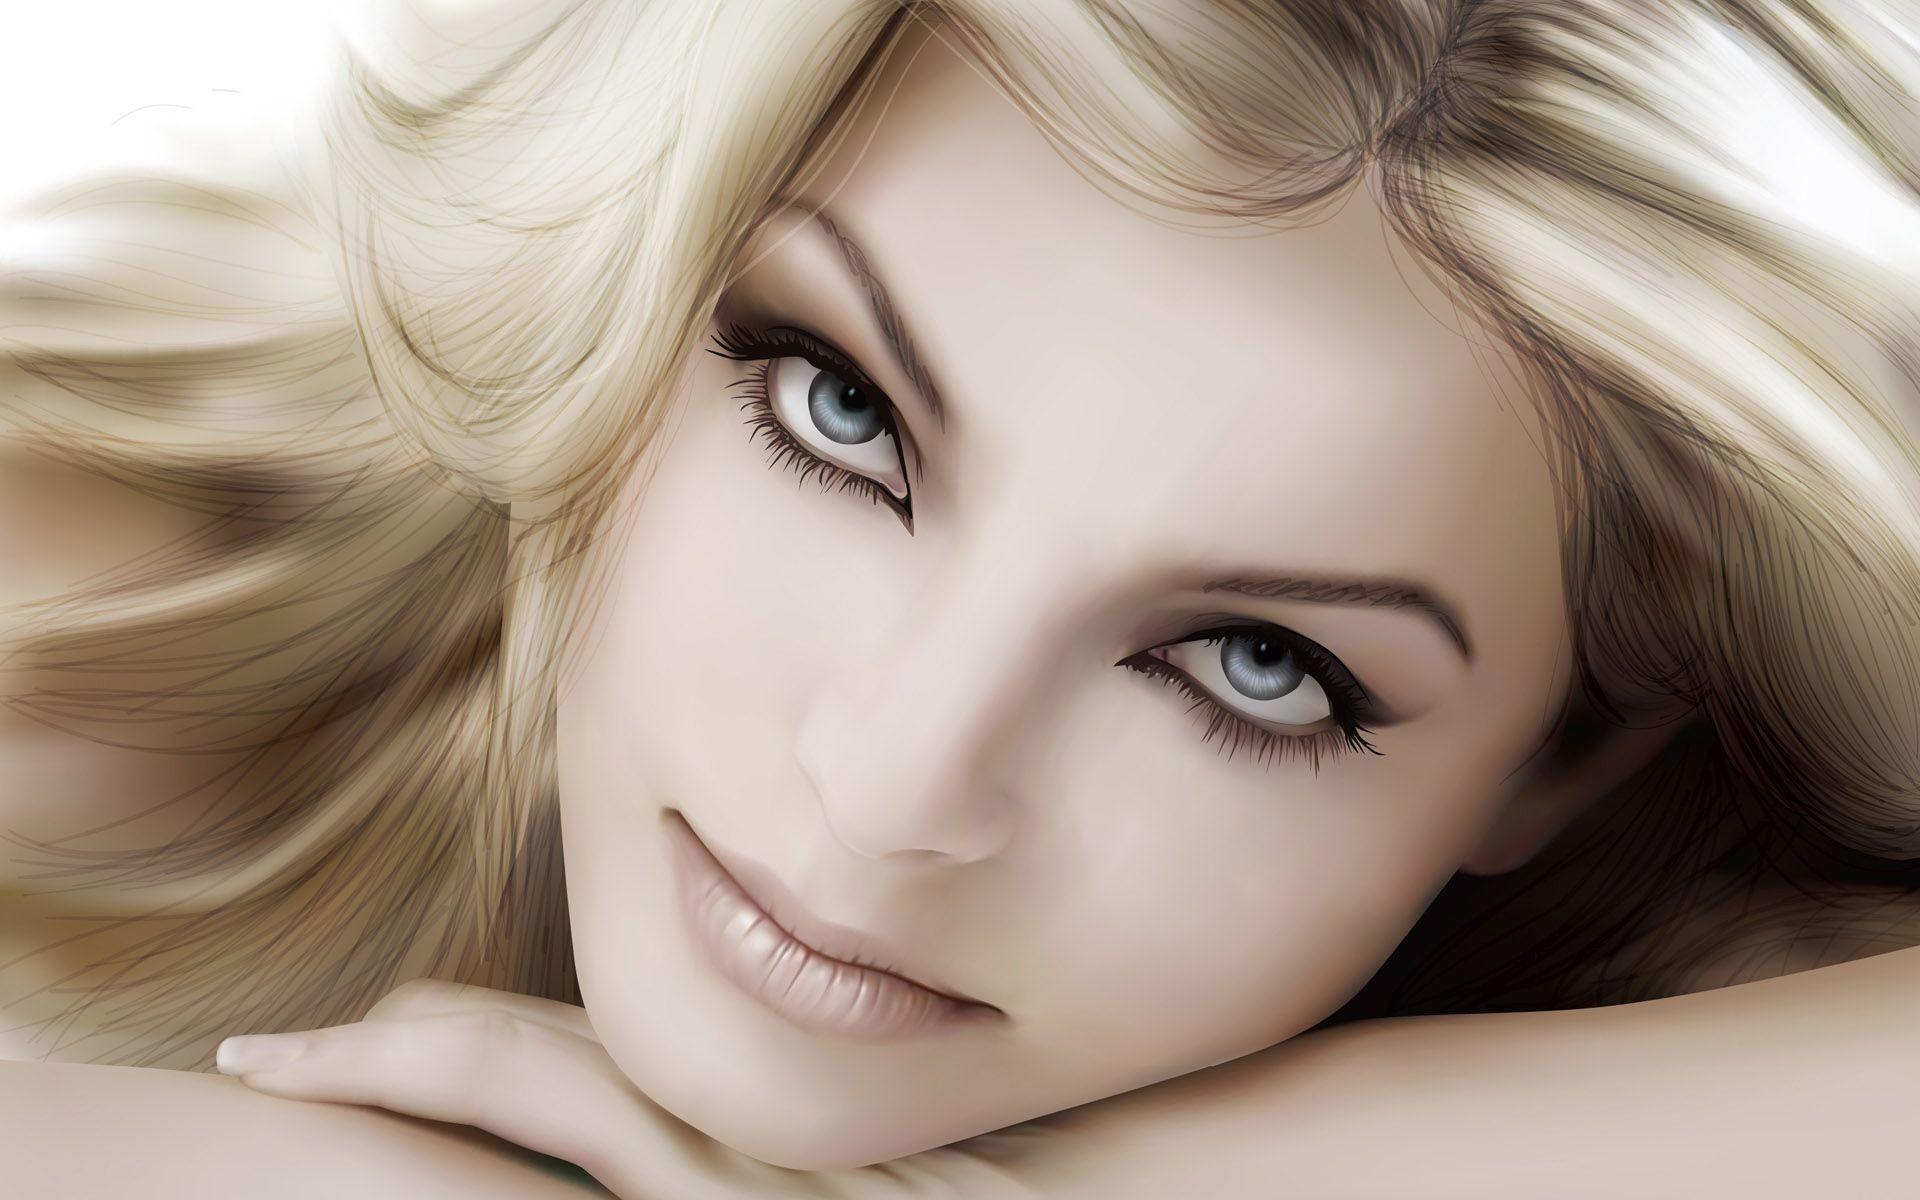 Beautiful girls face Wallpaper 26367